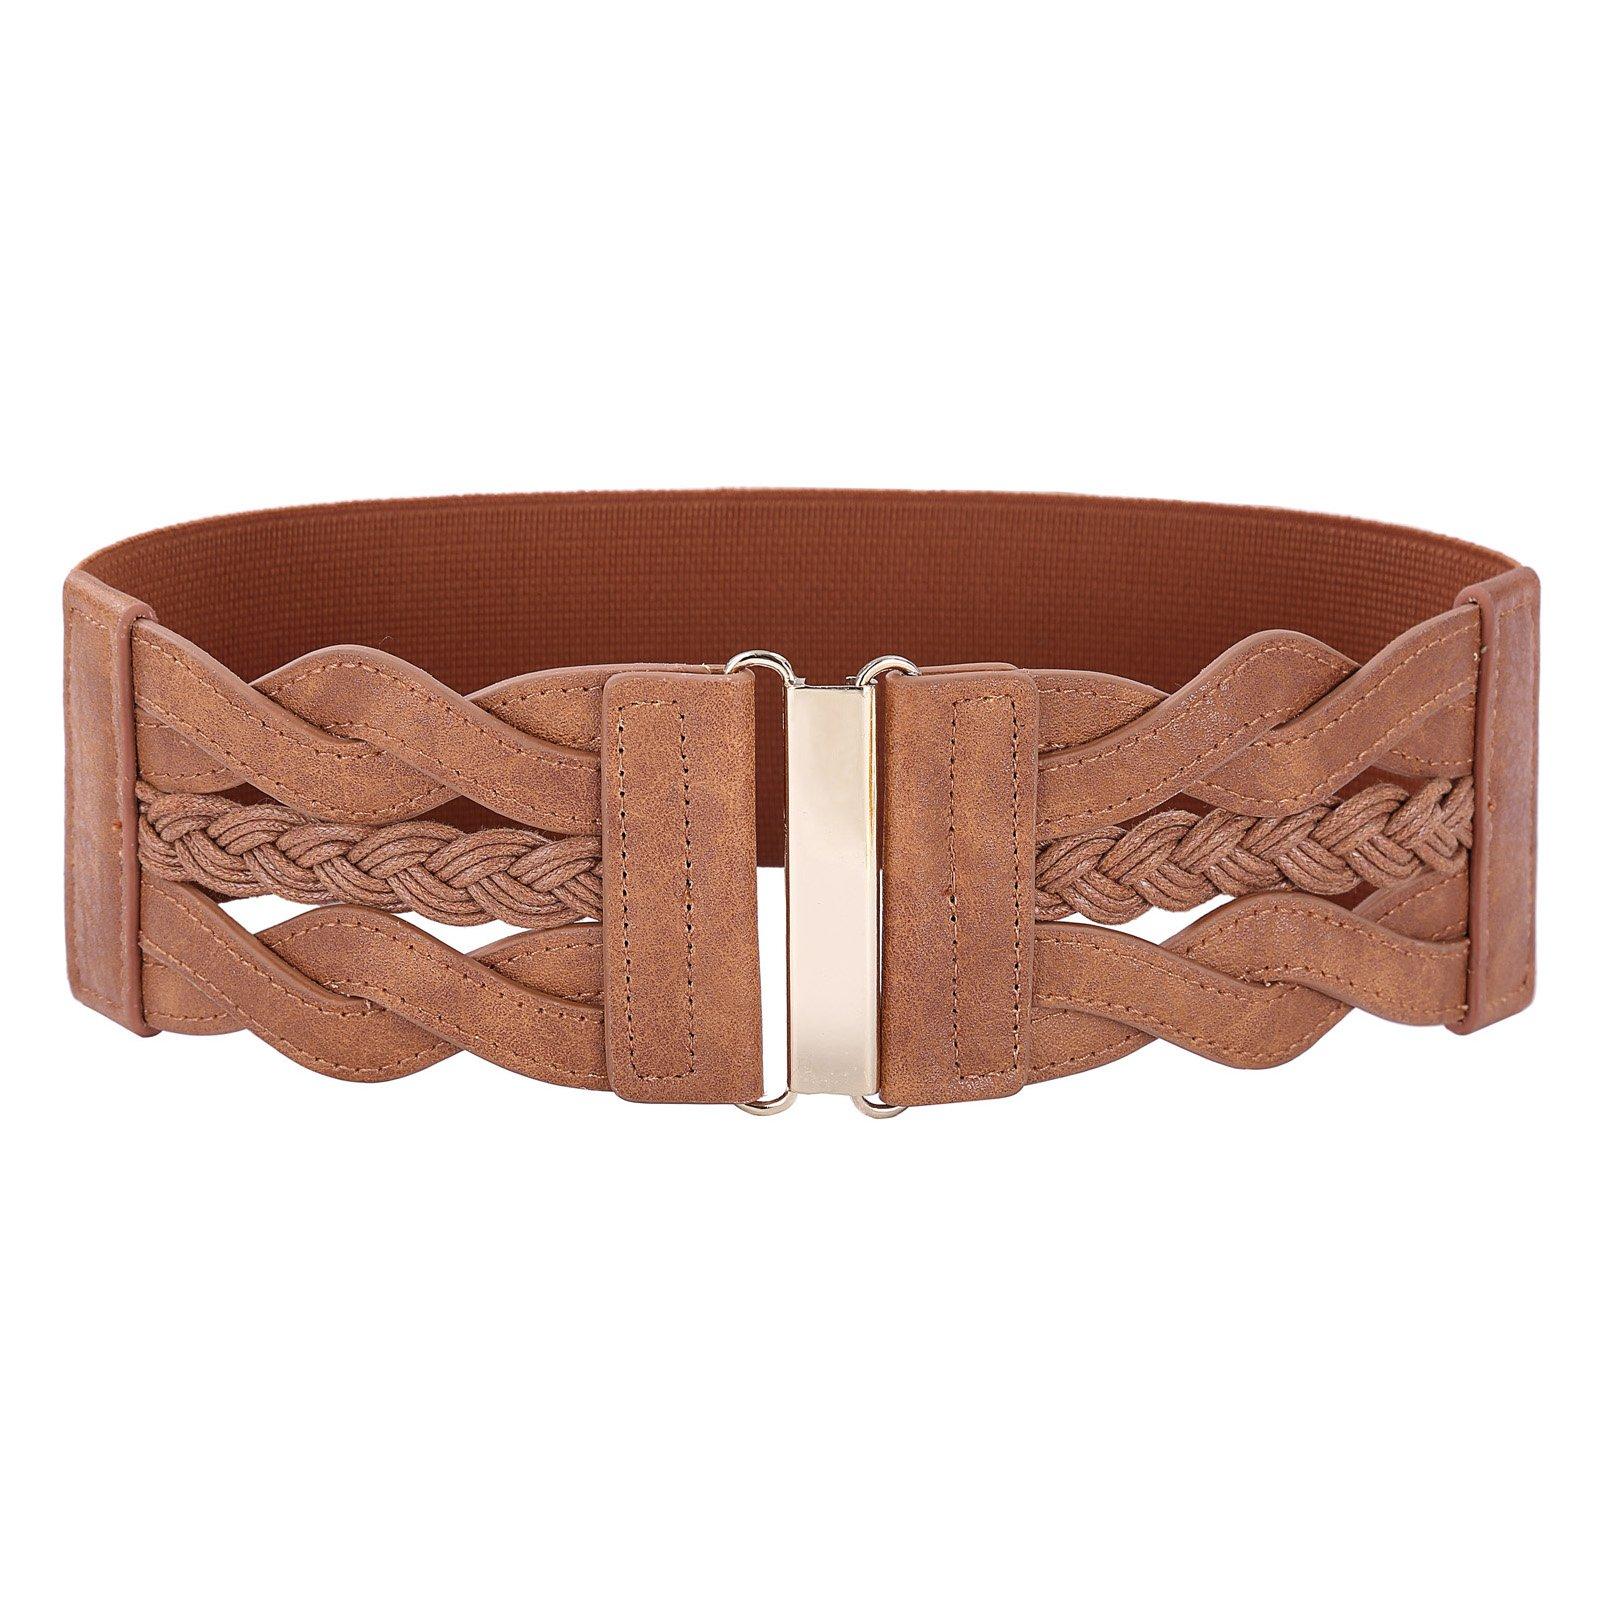 Fashion Wide Belt Braided Leatherette Women Cinch Belt (Brown, M)